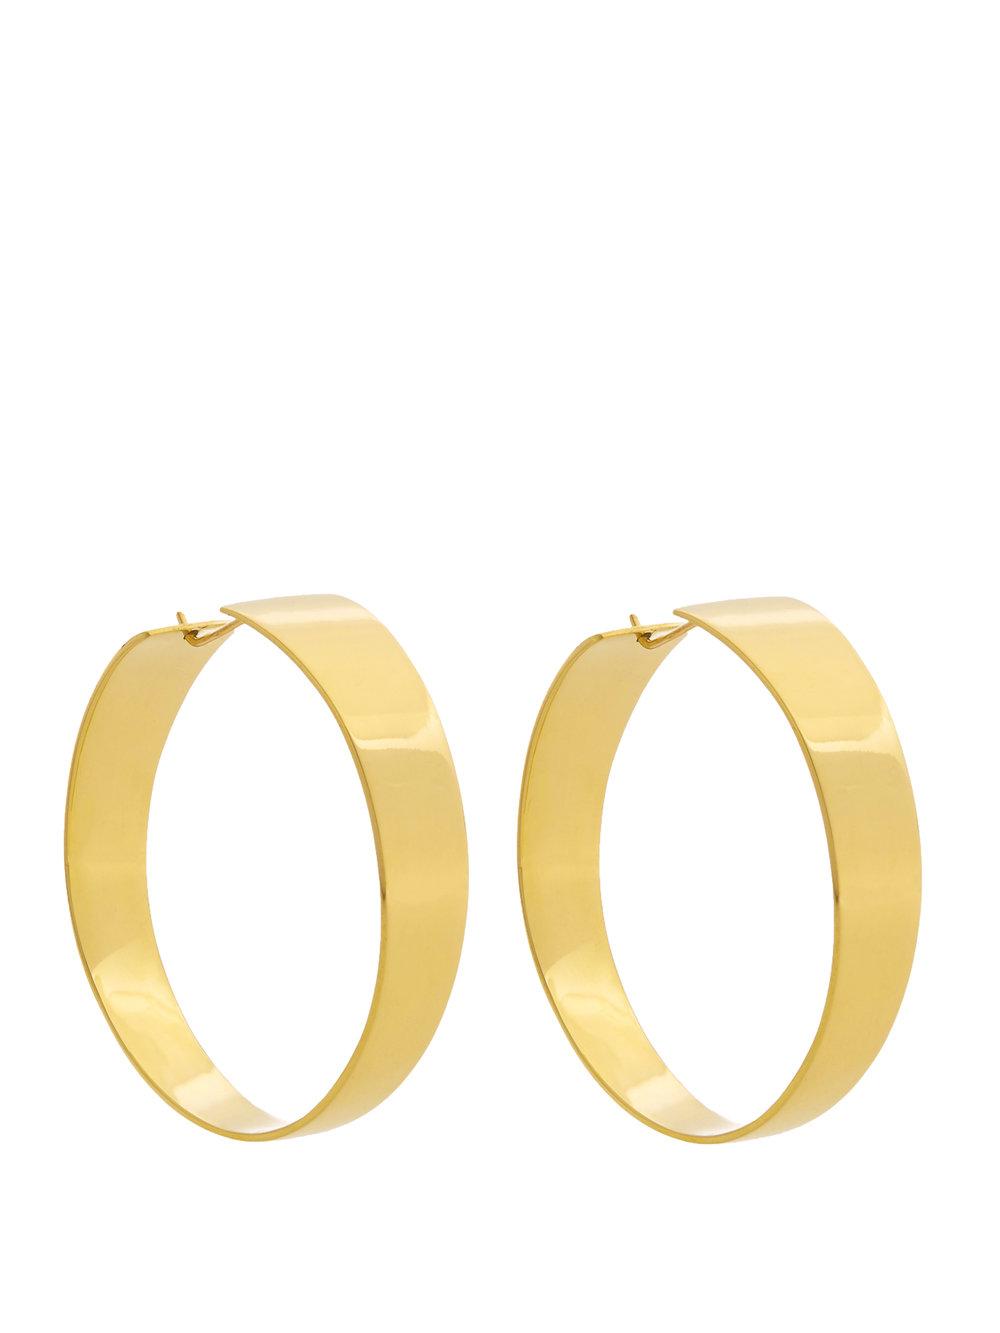 FAYE ANDRADA - gold hoop earrings